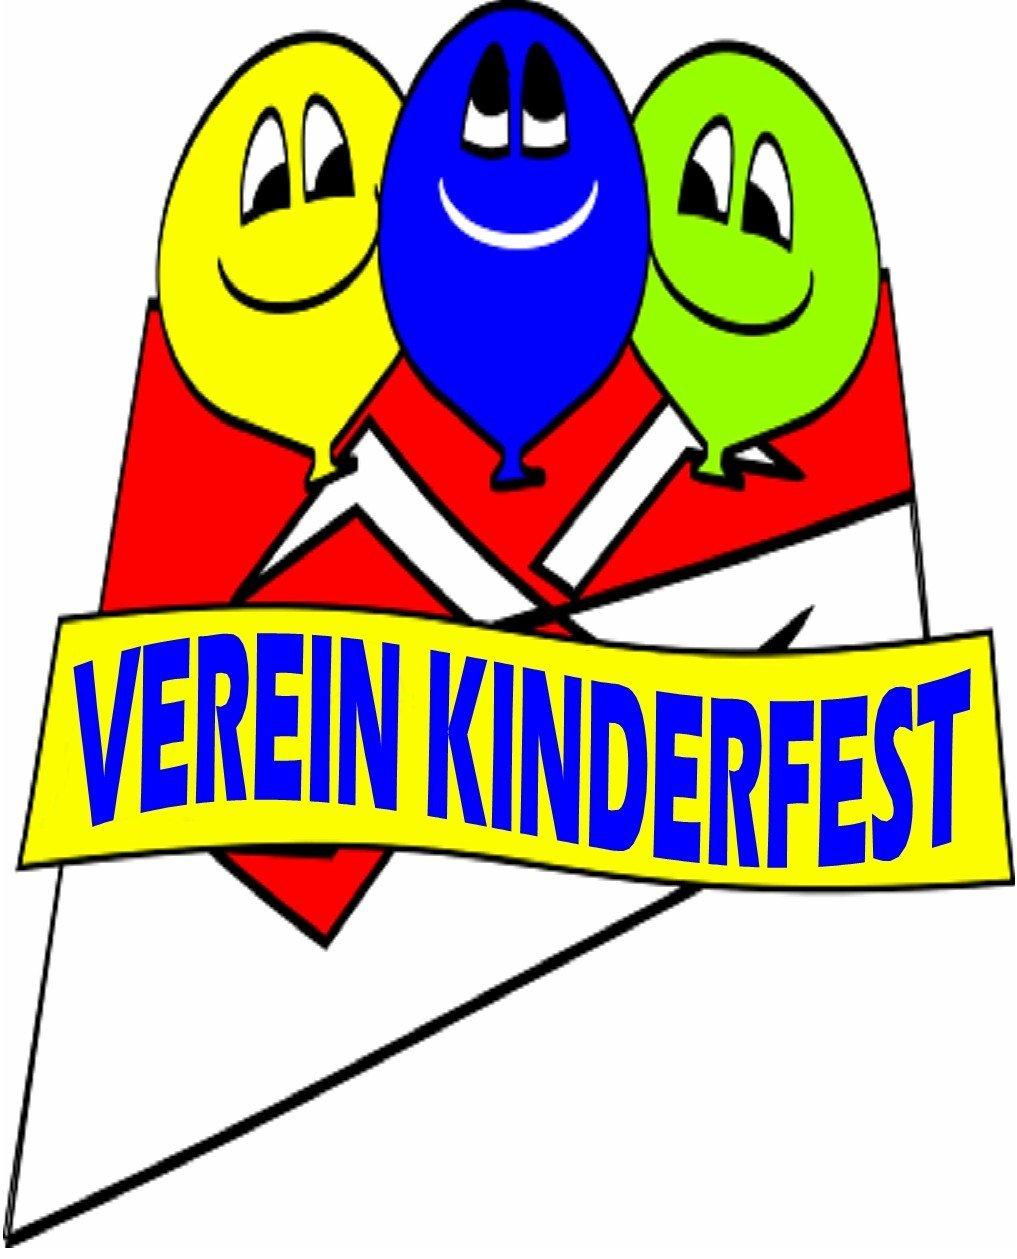 Verein Kinderfest Biberist